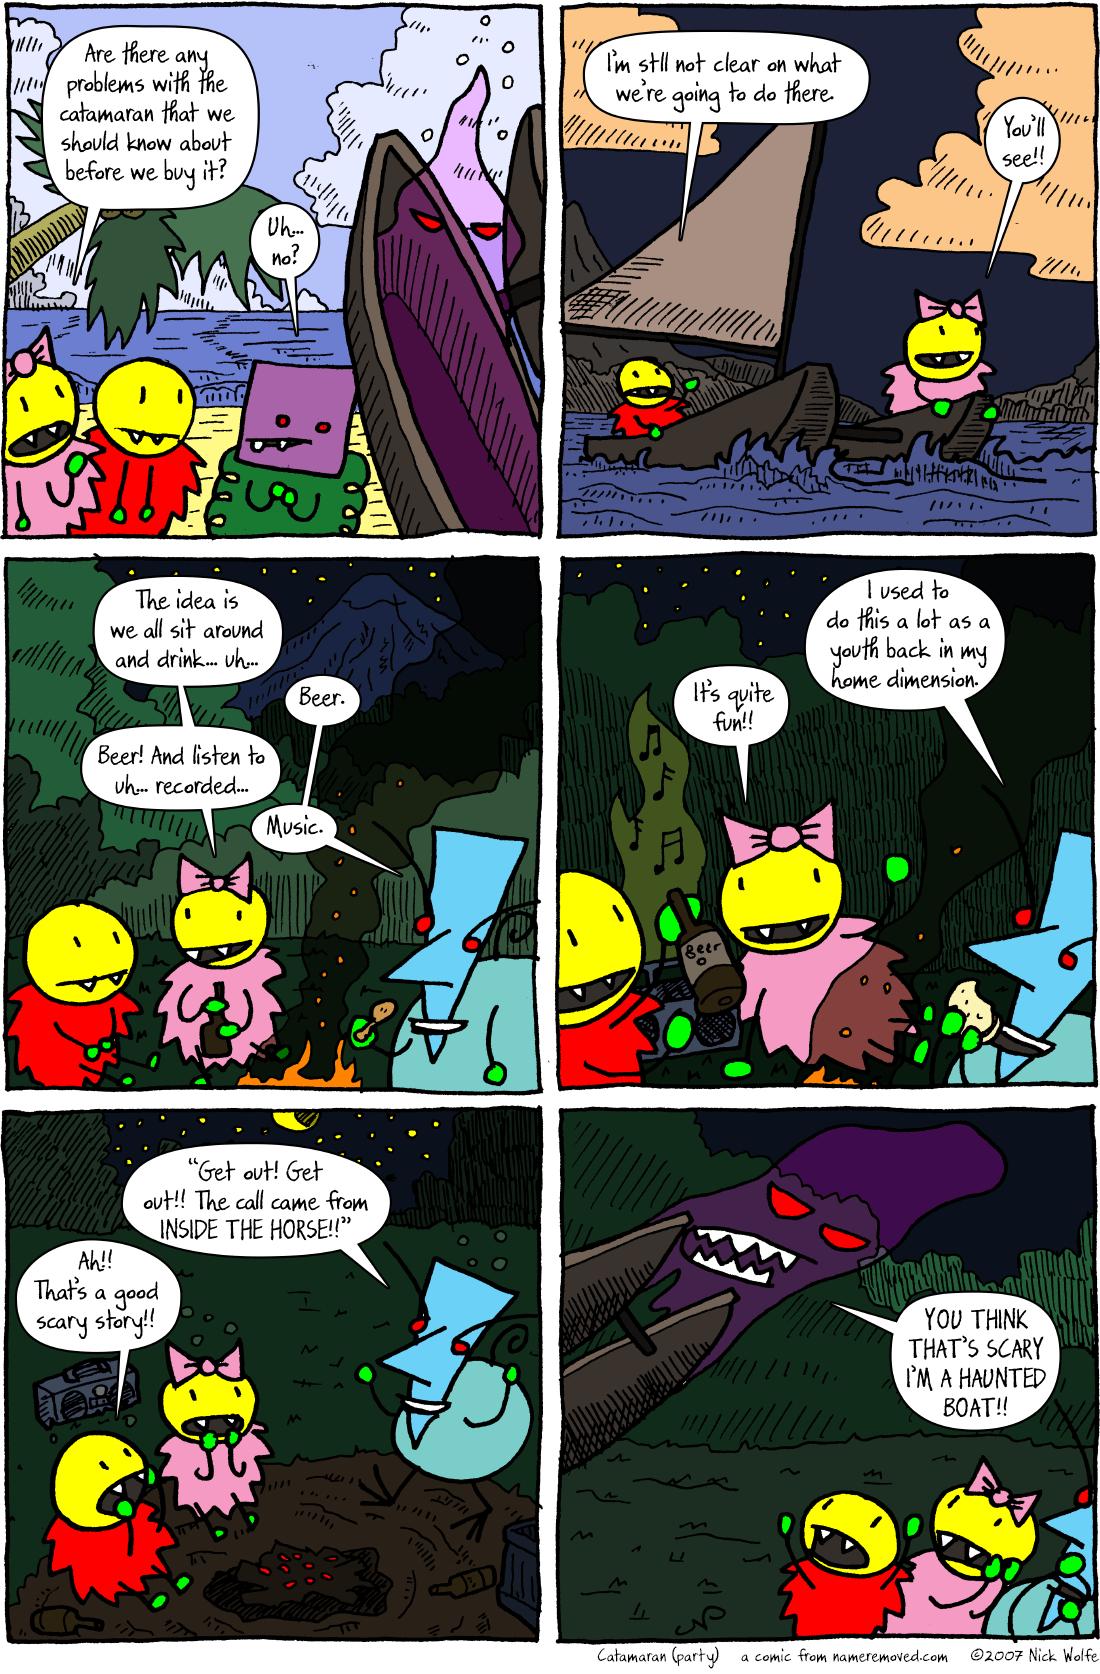 Catamaran (party)